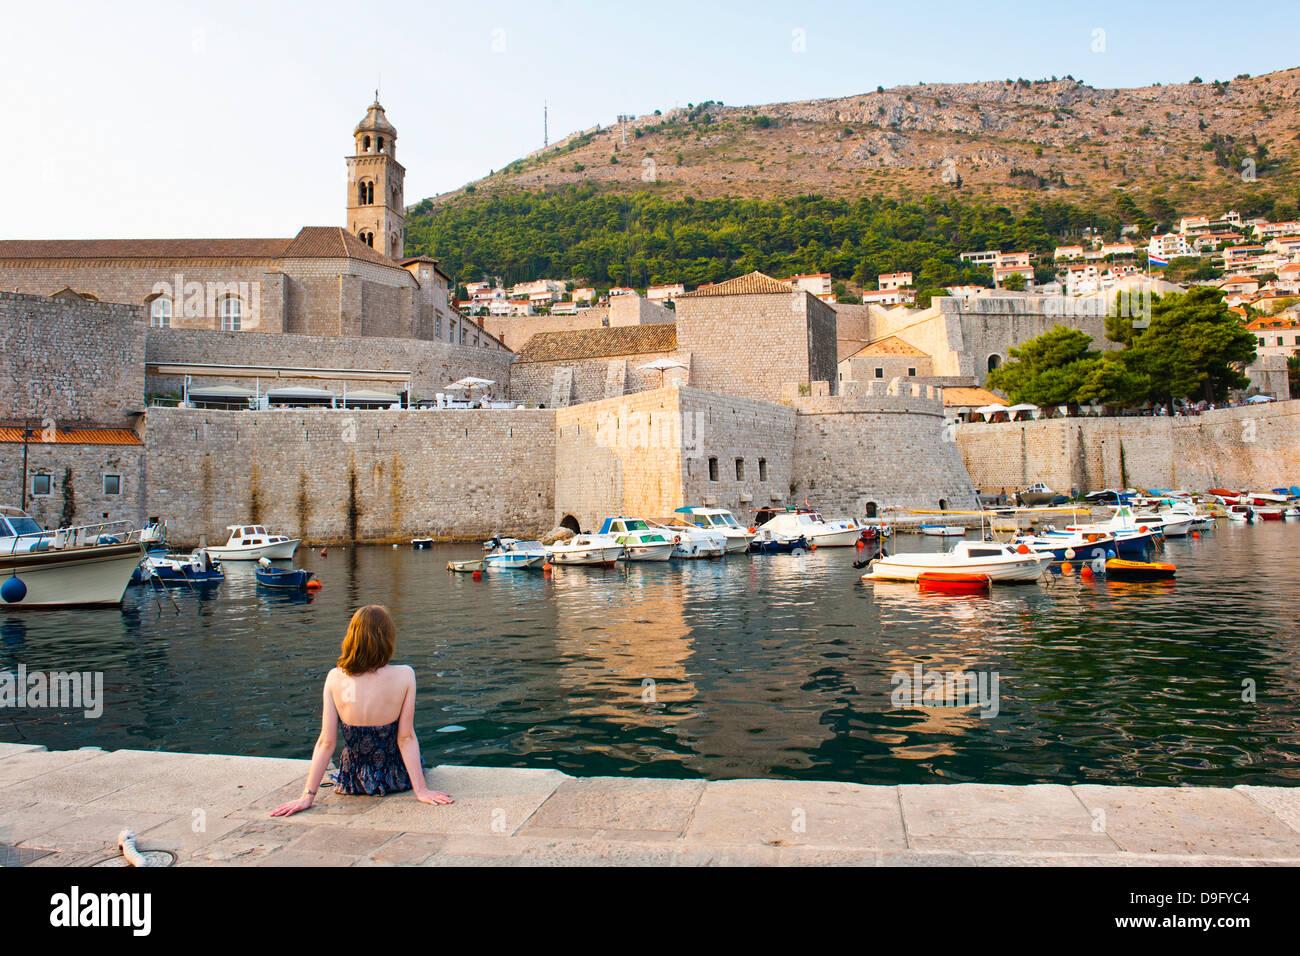 Tourist admiring Dominican Monastery, Dubrovnik Old Town, UNESCO World Heritage Site, Dubrovnik, Dalmatian Coast, - Stock Image